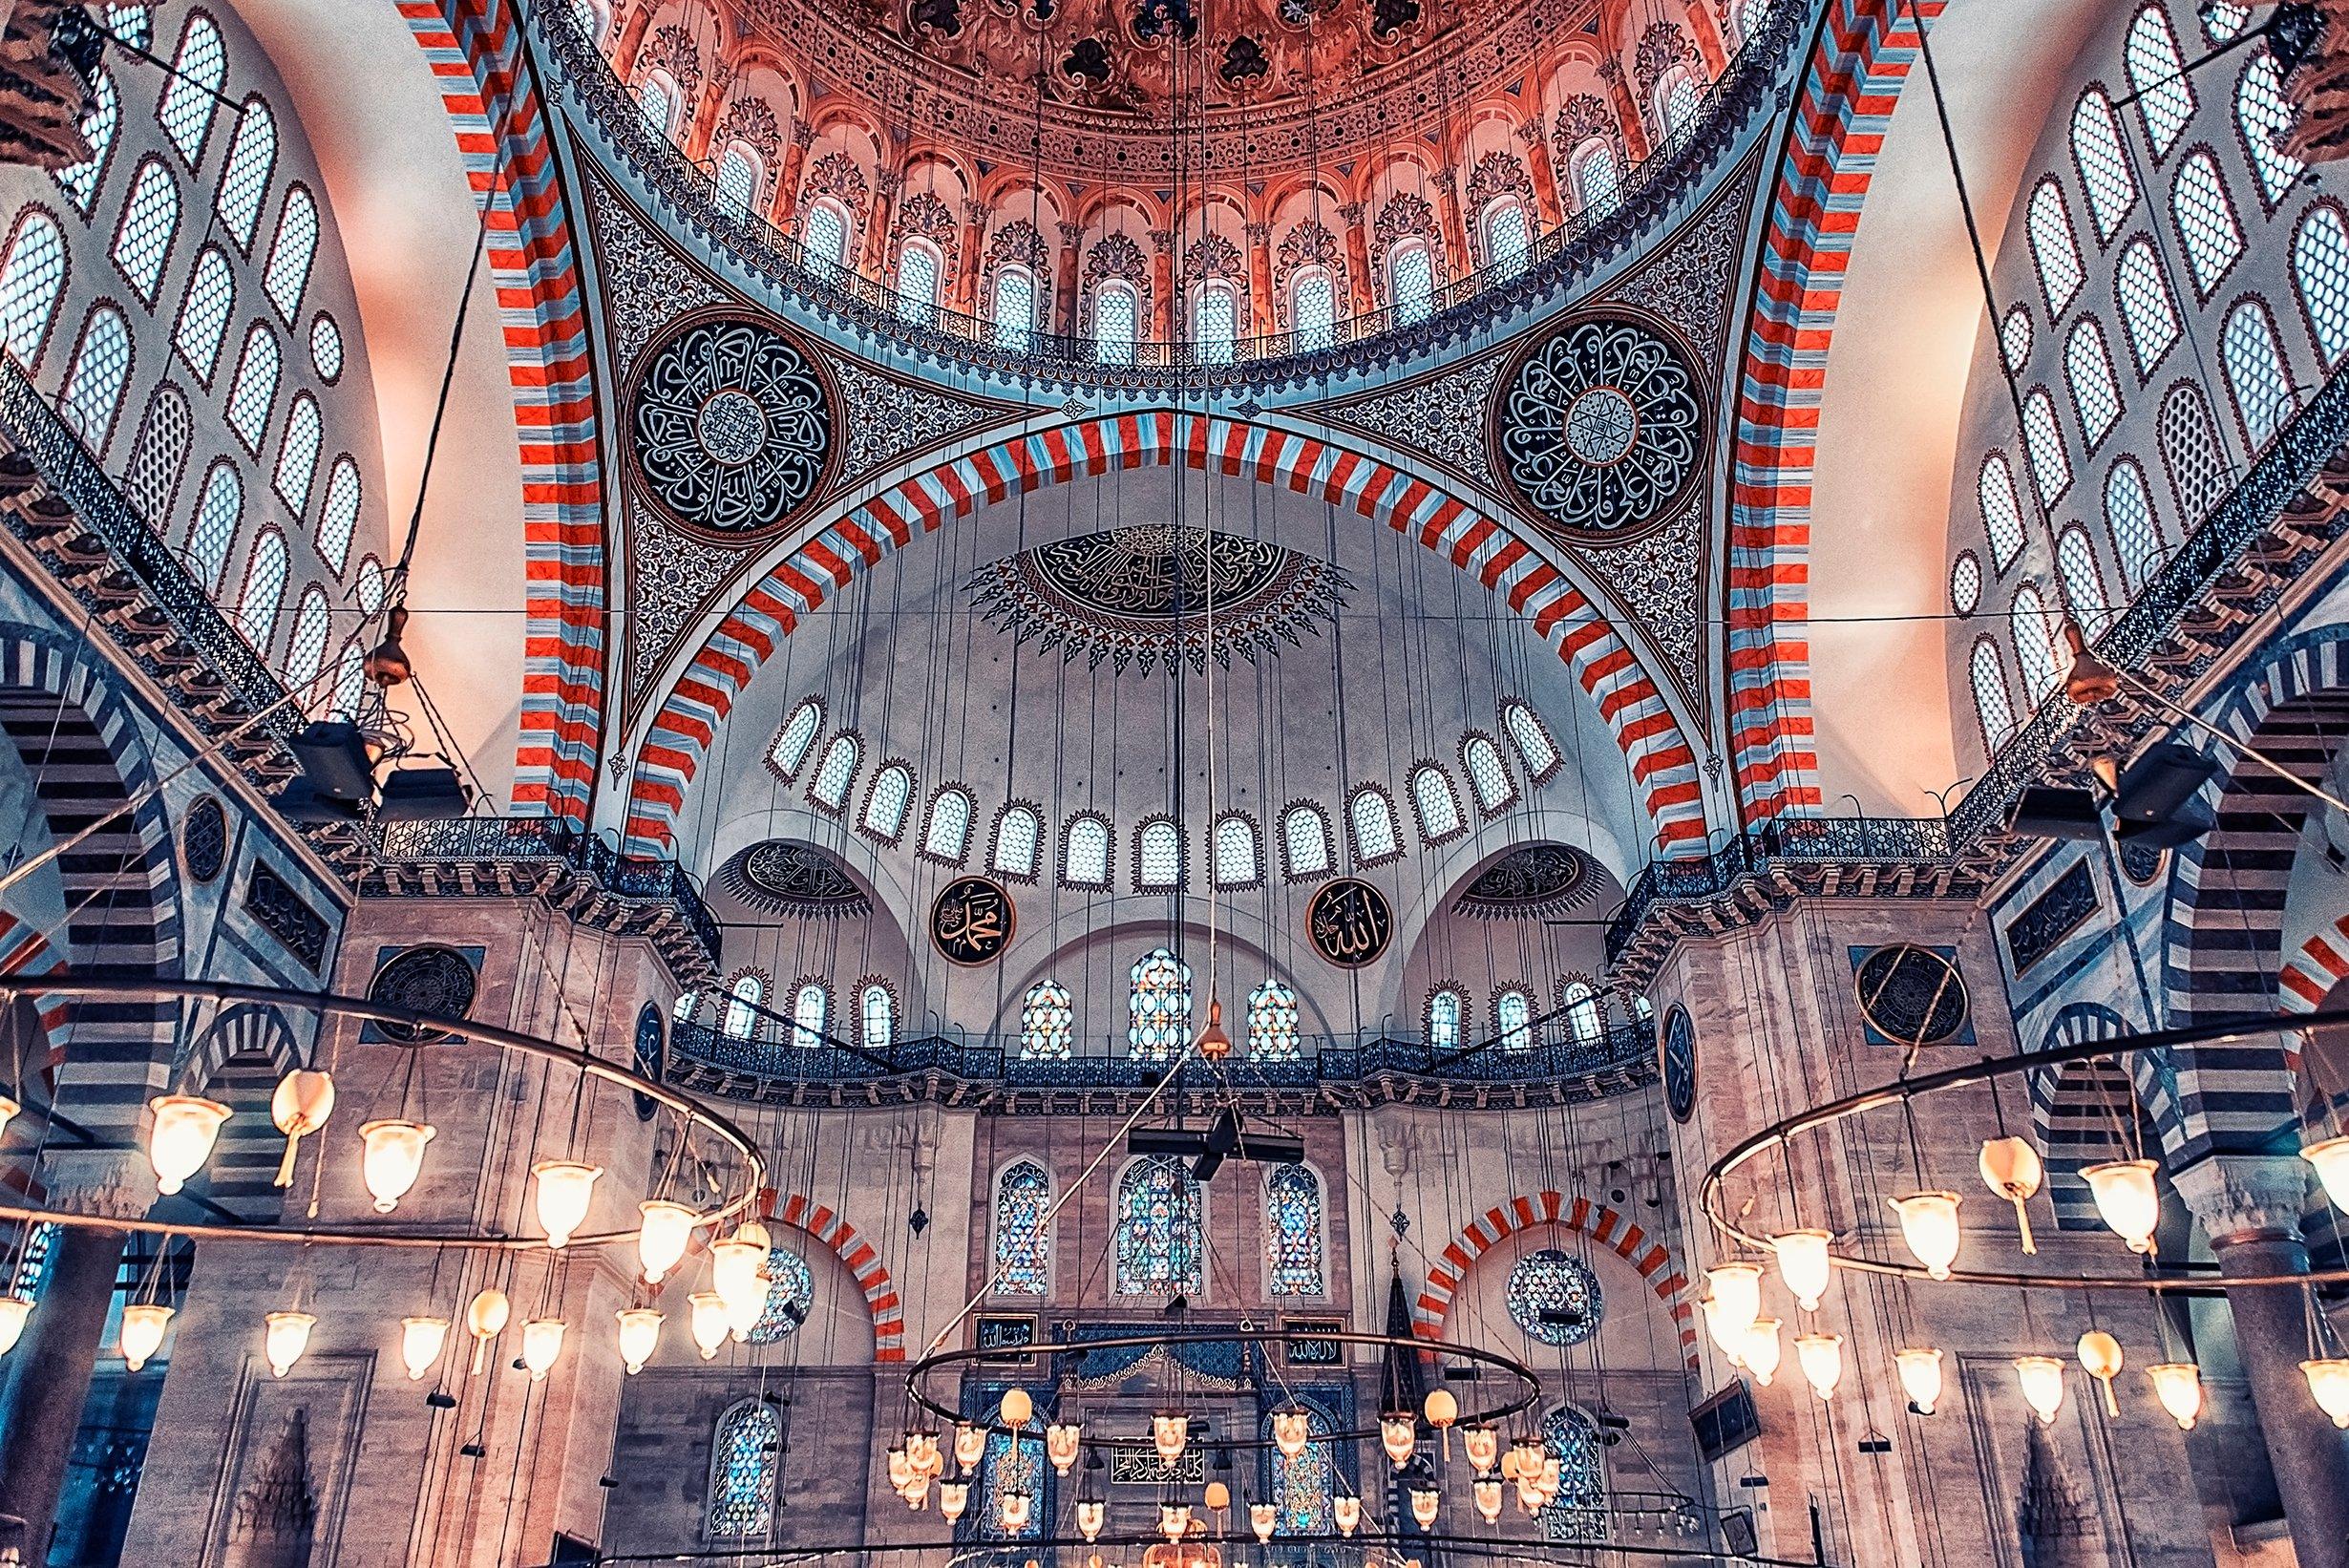 A photo showing interior of the Süleymaniye Mosque. (iStock Photo)